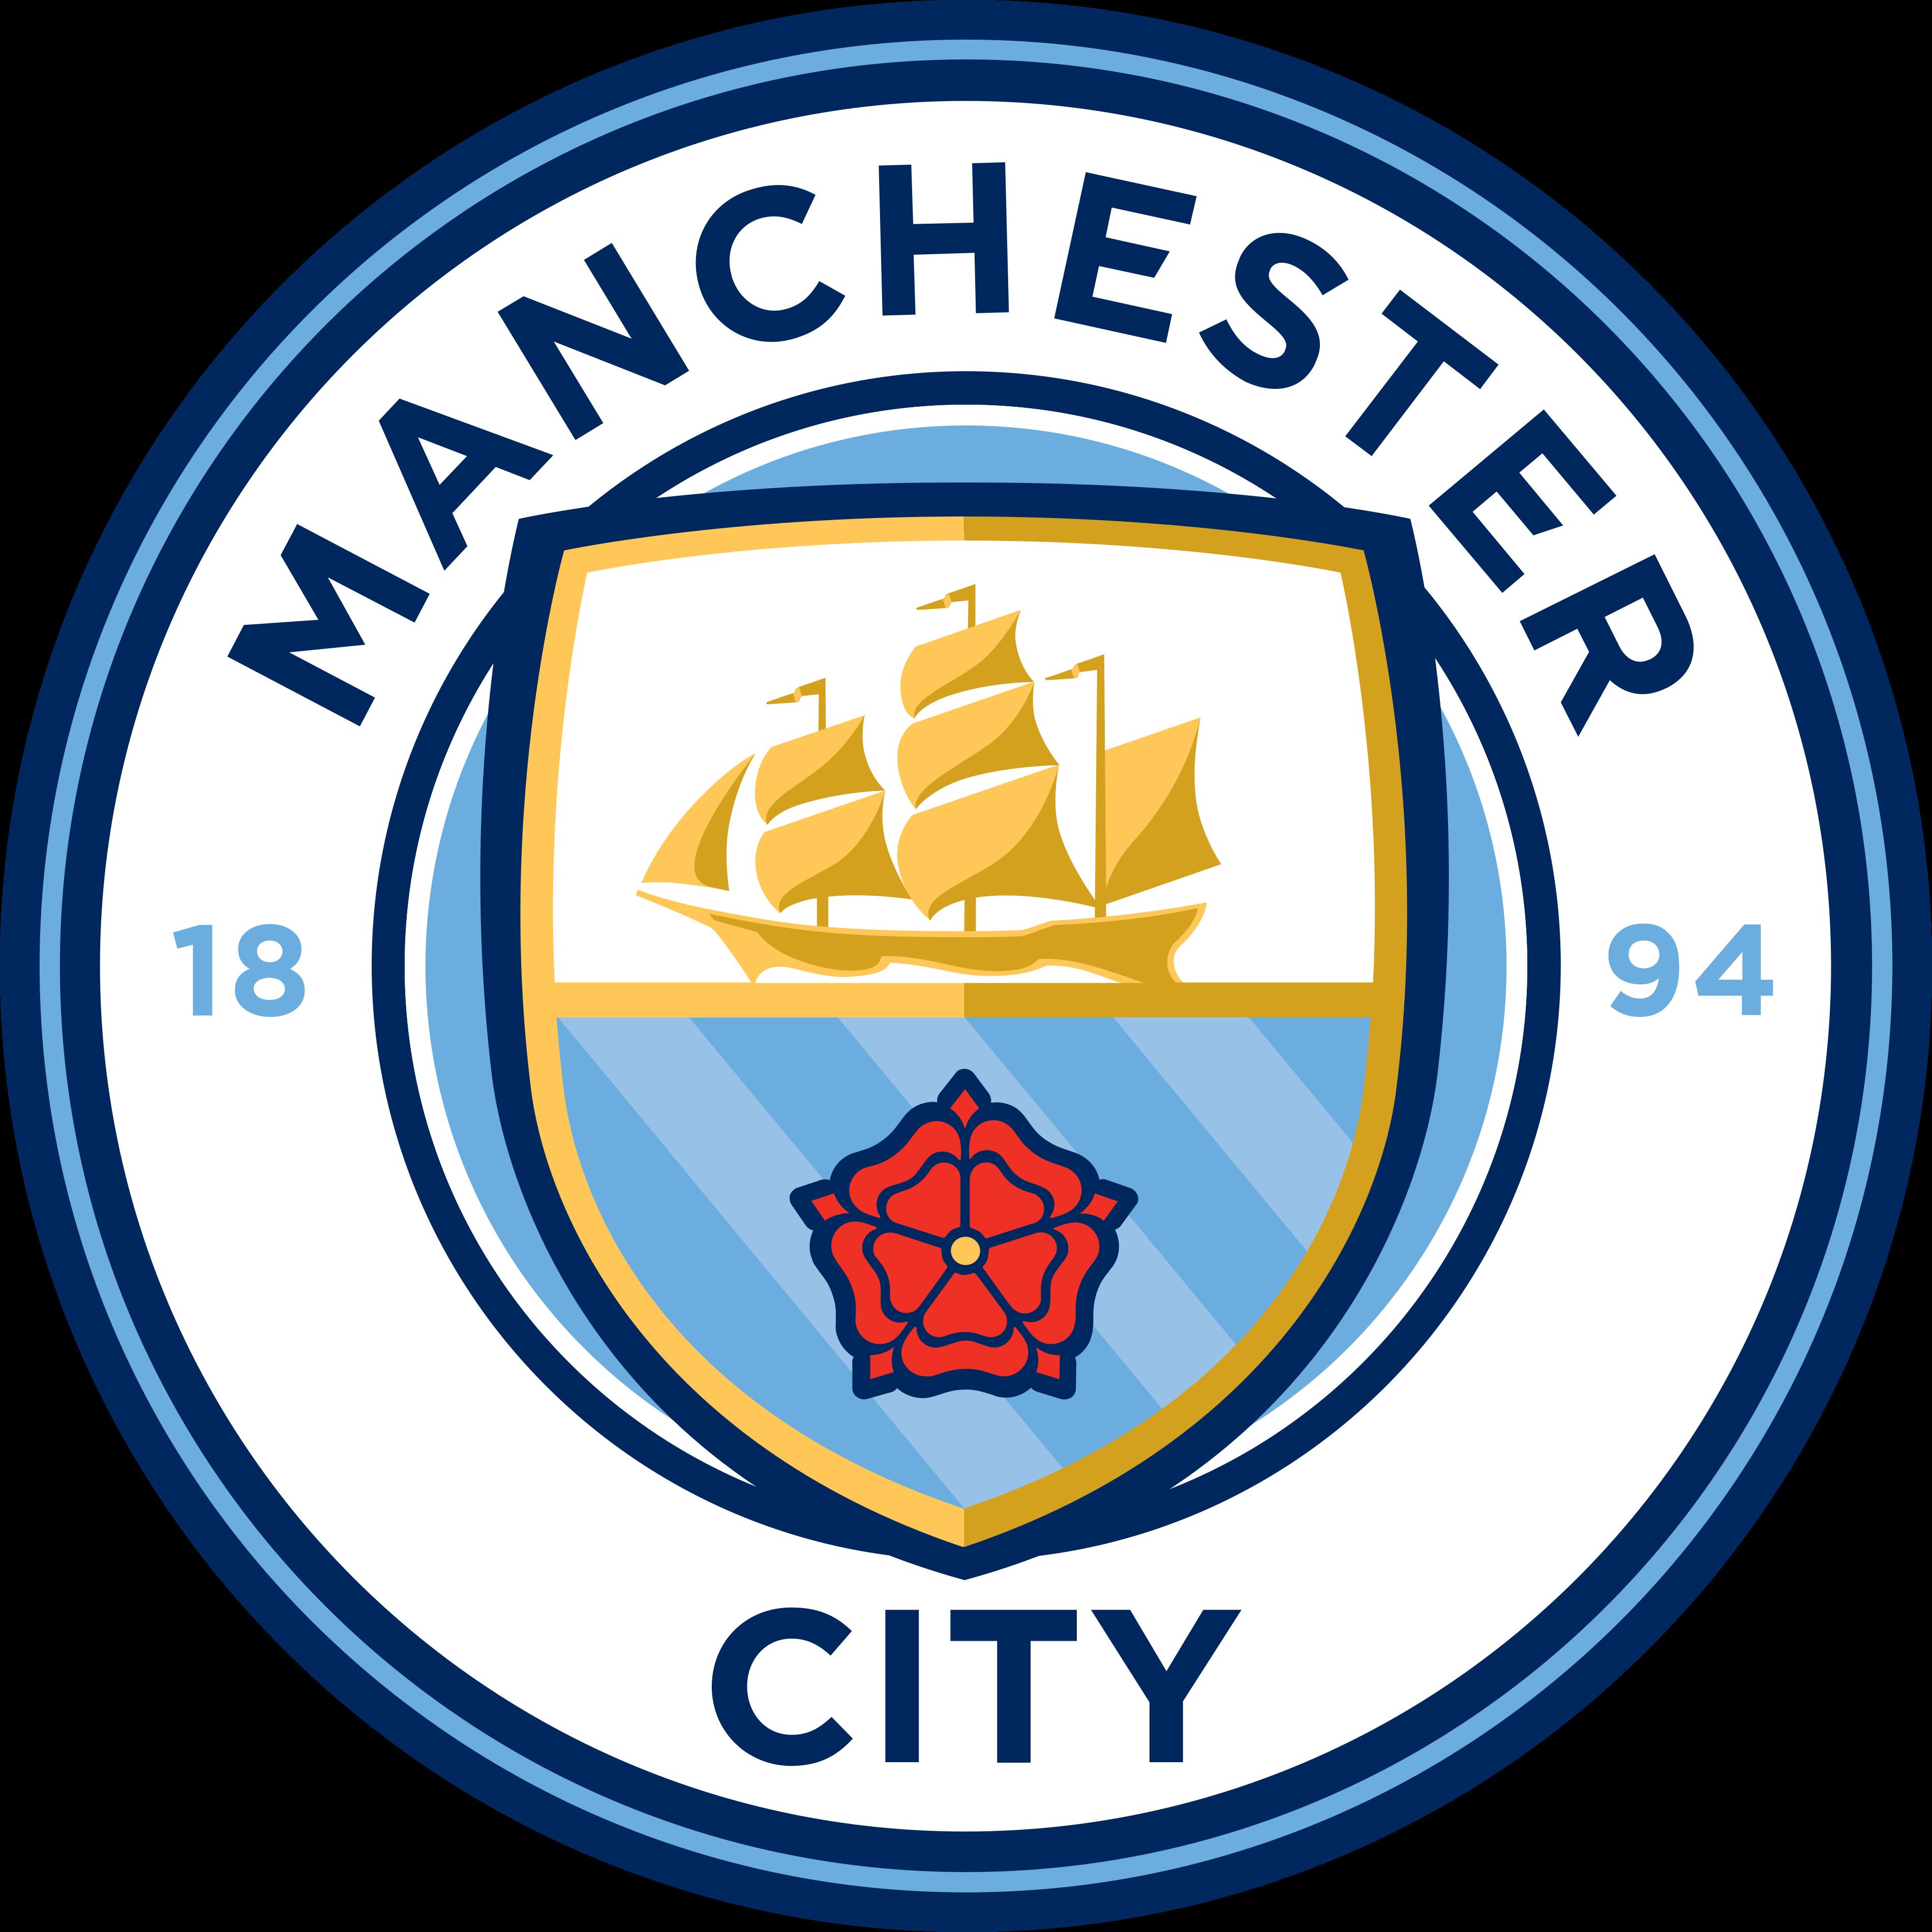 Escudo Manchester City Football Club - Escudo.Biz - Baixar ...